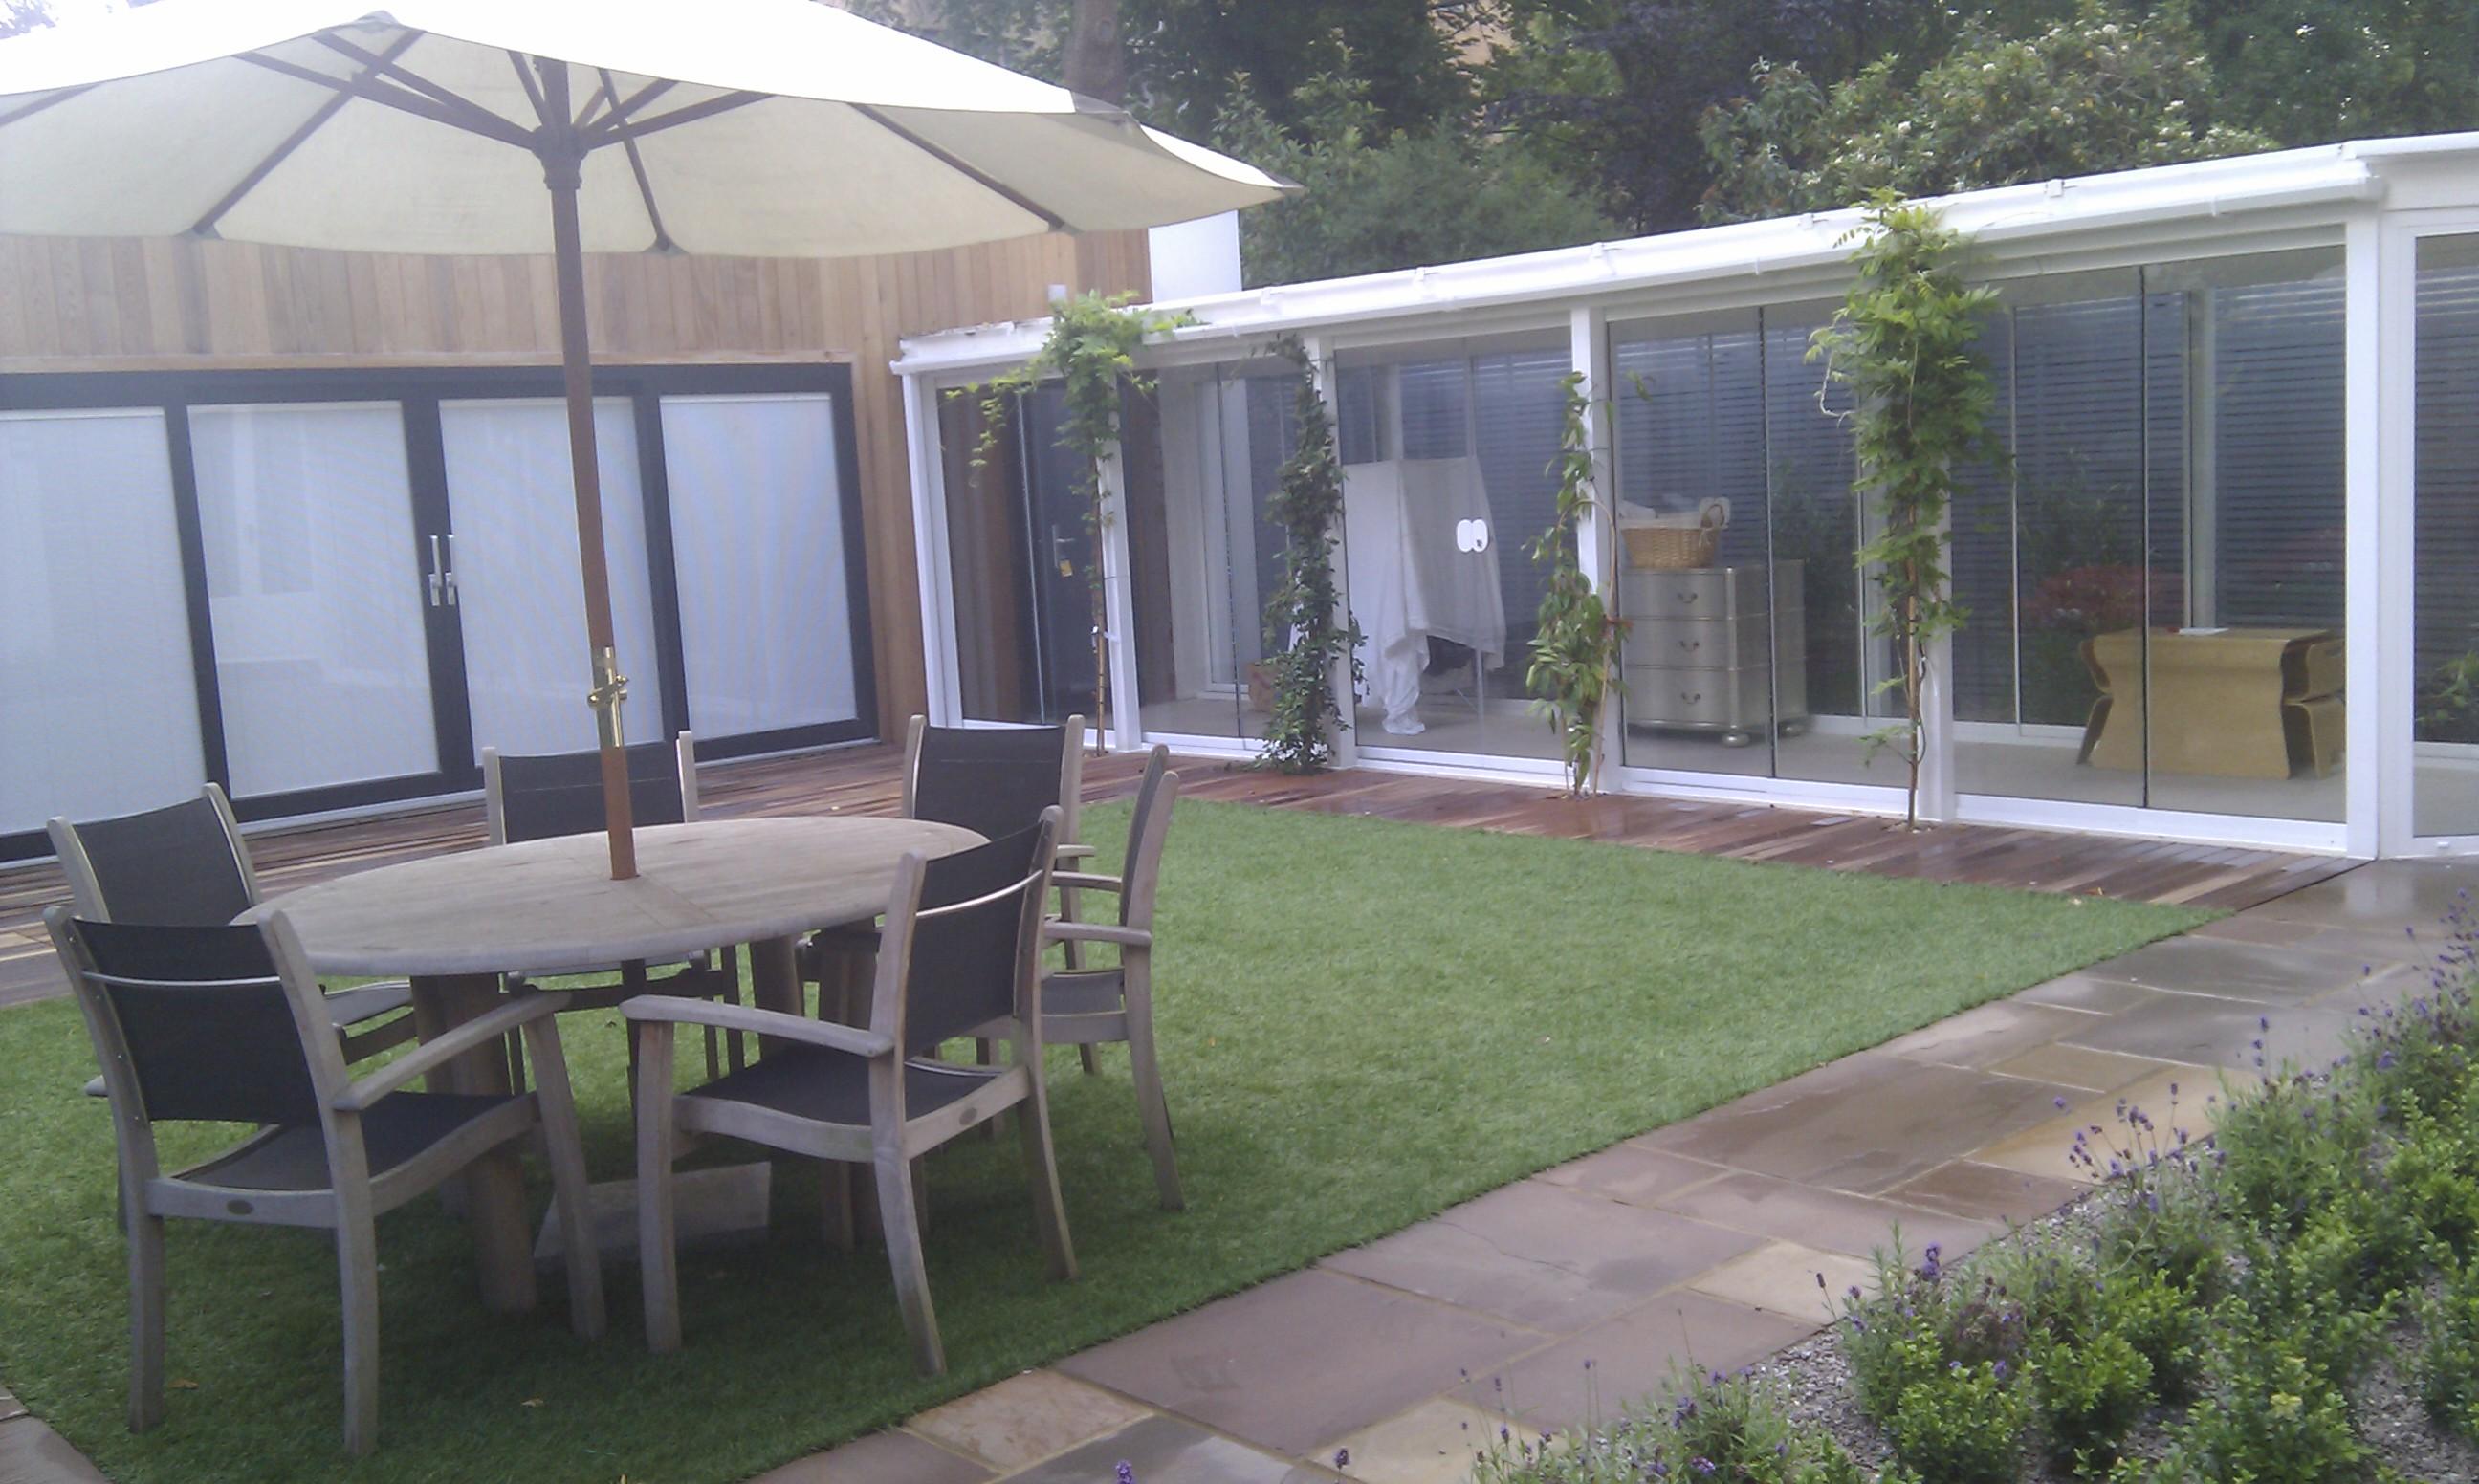 modern garden design london slatted grey privacy screen sandstone paving easy grass balau hardwood decking (27)